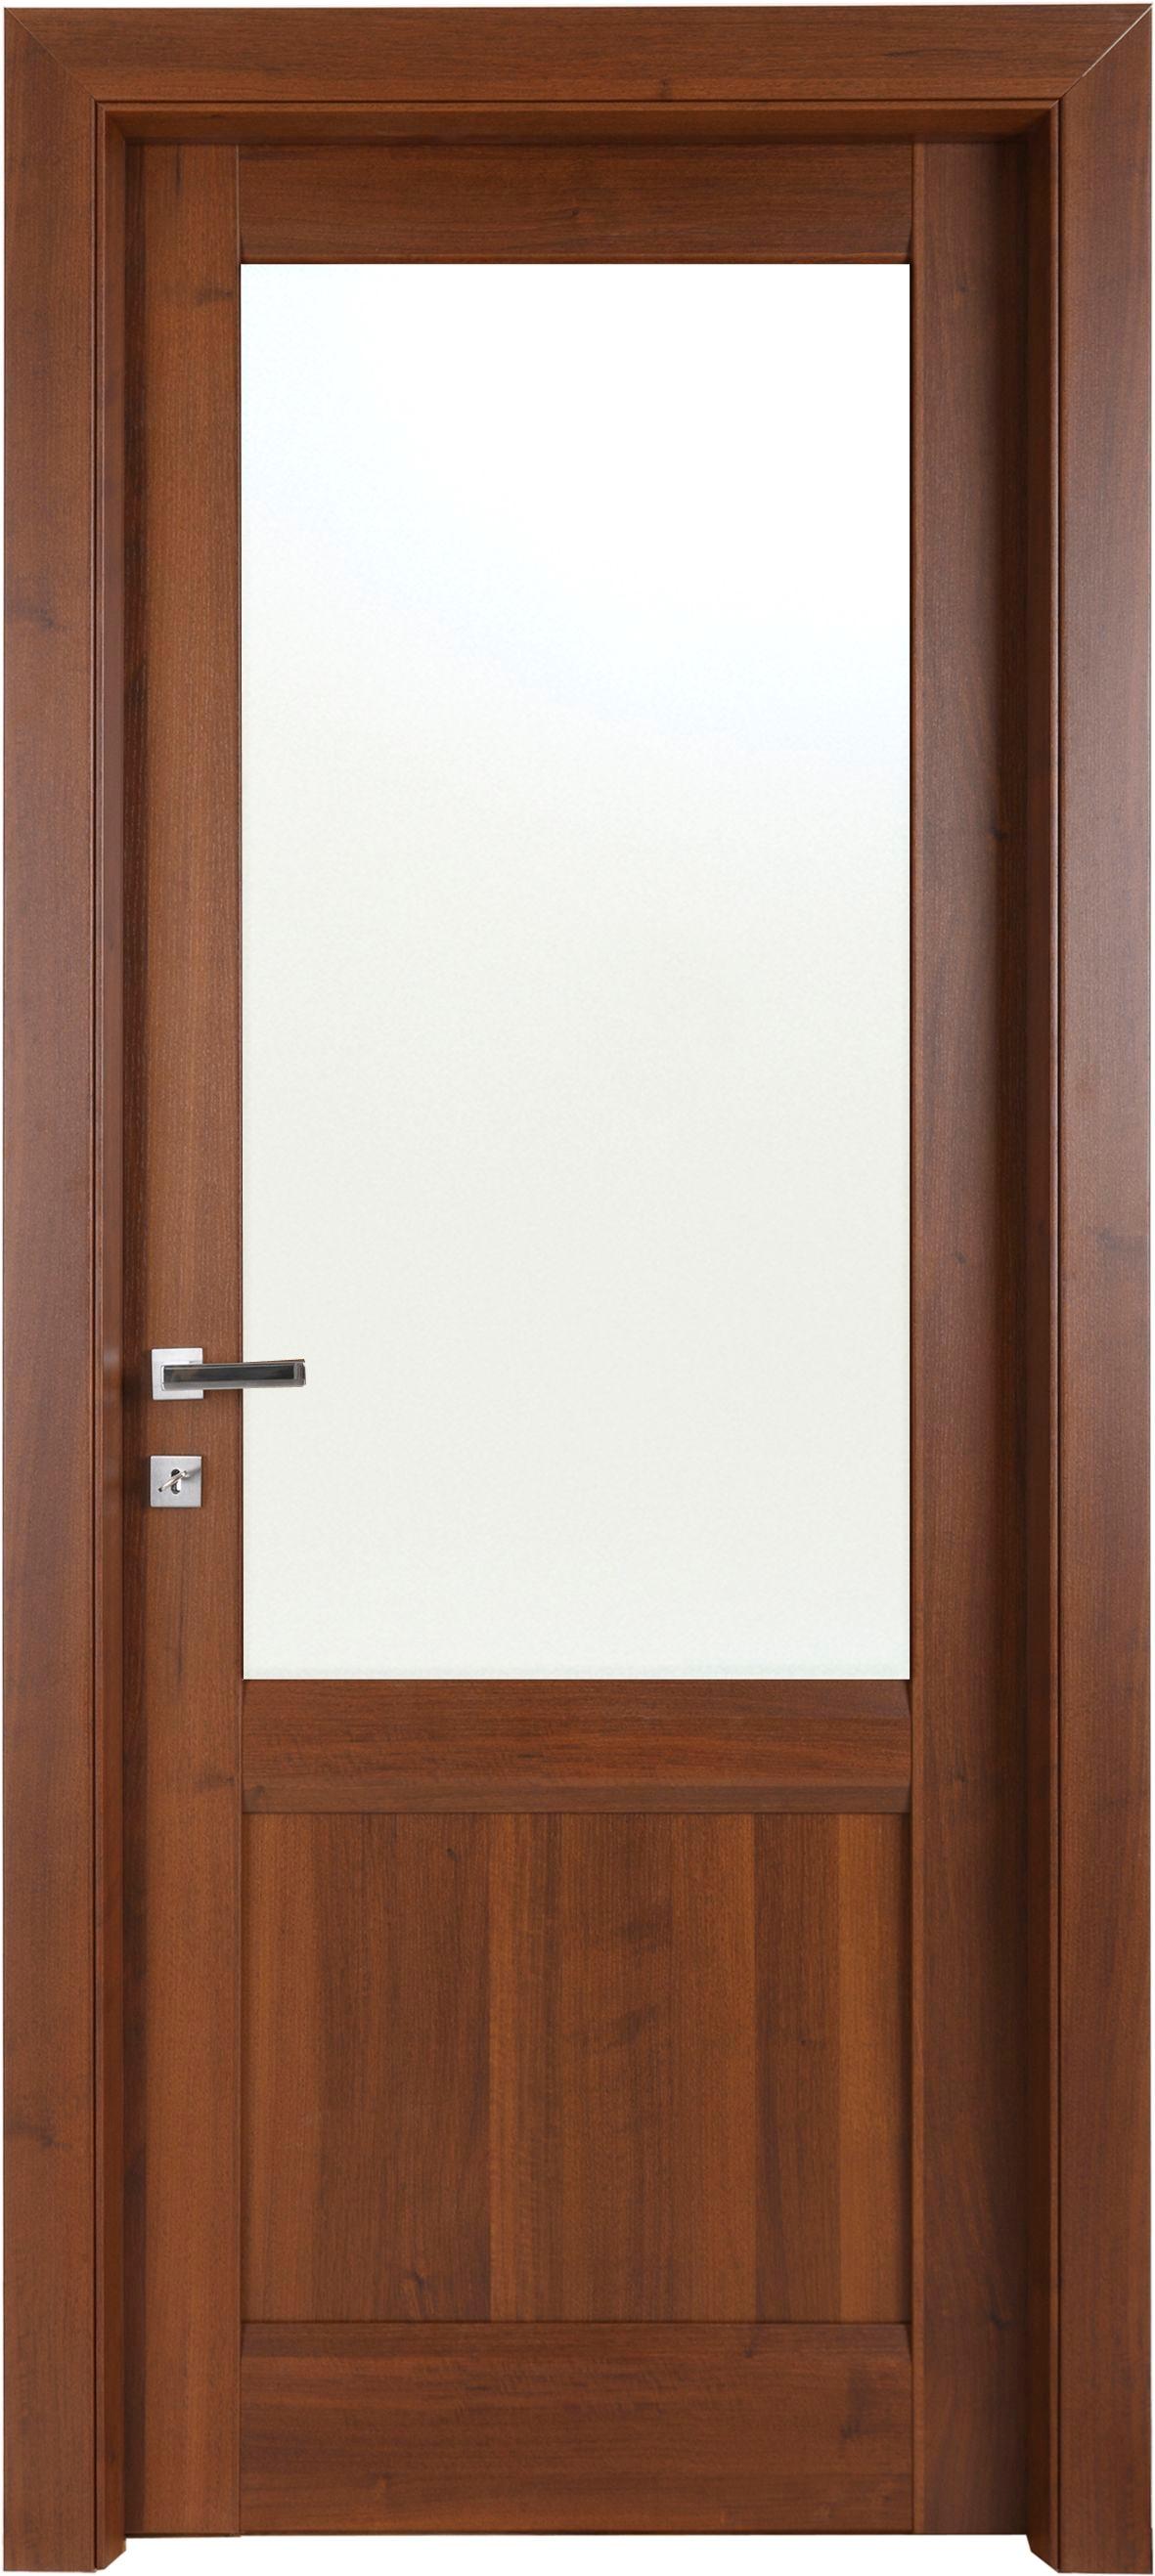 Porta bertolotto sydney 102 vetro scontato del 71 - Porte scorrevoli in vetro leroy merlin ...